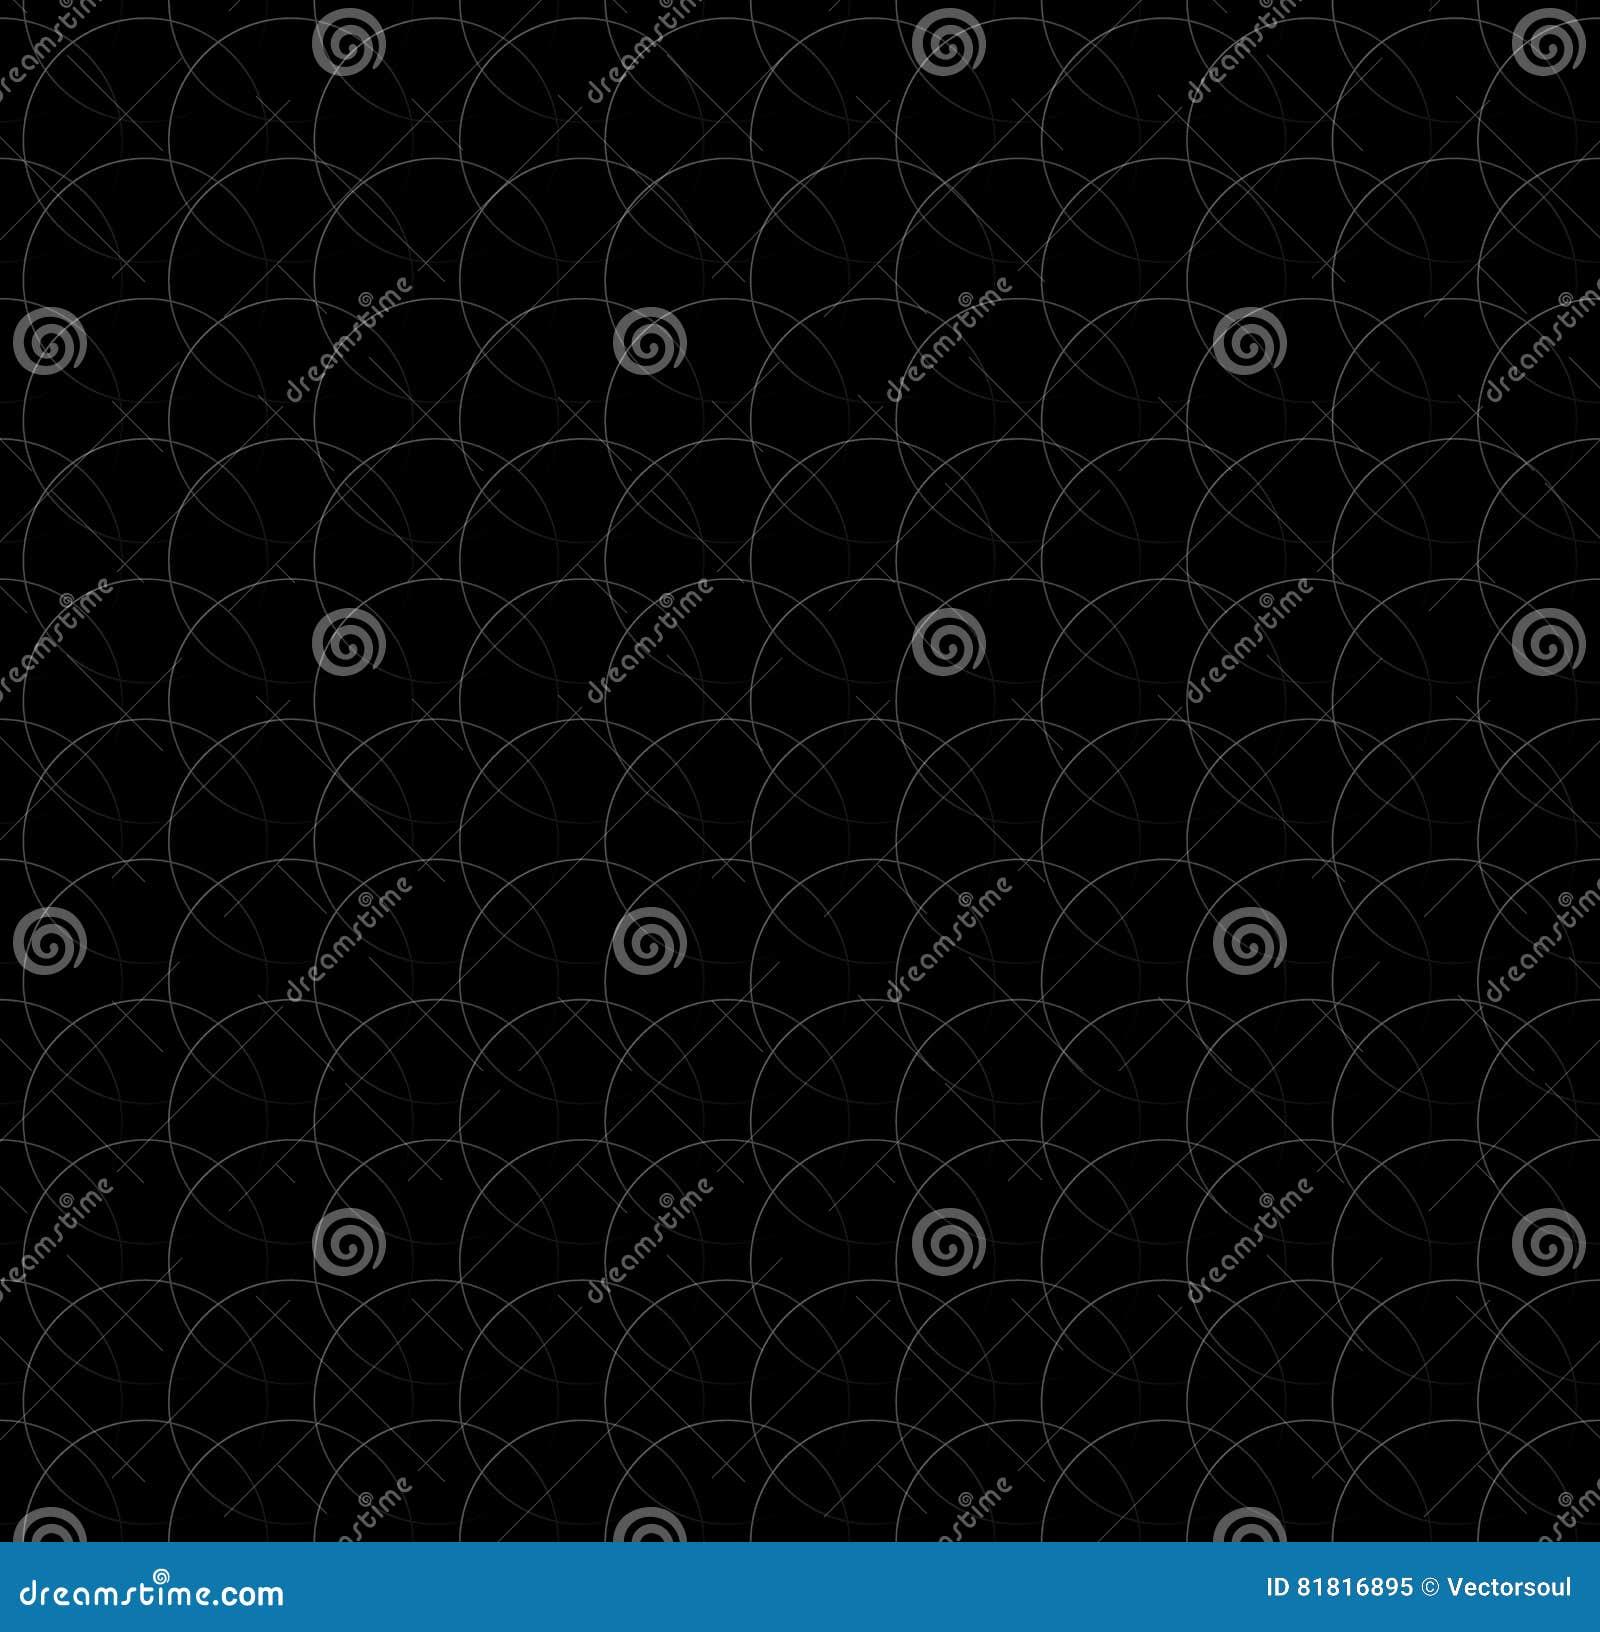 Repeatable pattern w/ interlocking circles, rings. Regular monochrome seamless geometric pattern.